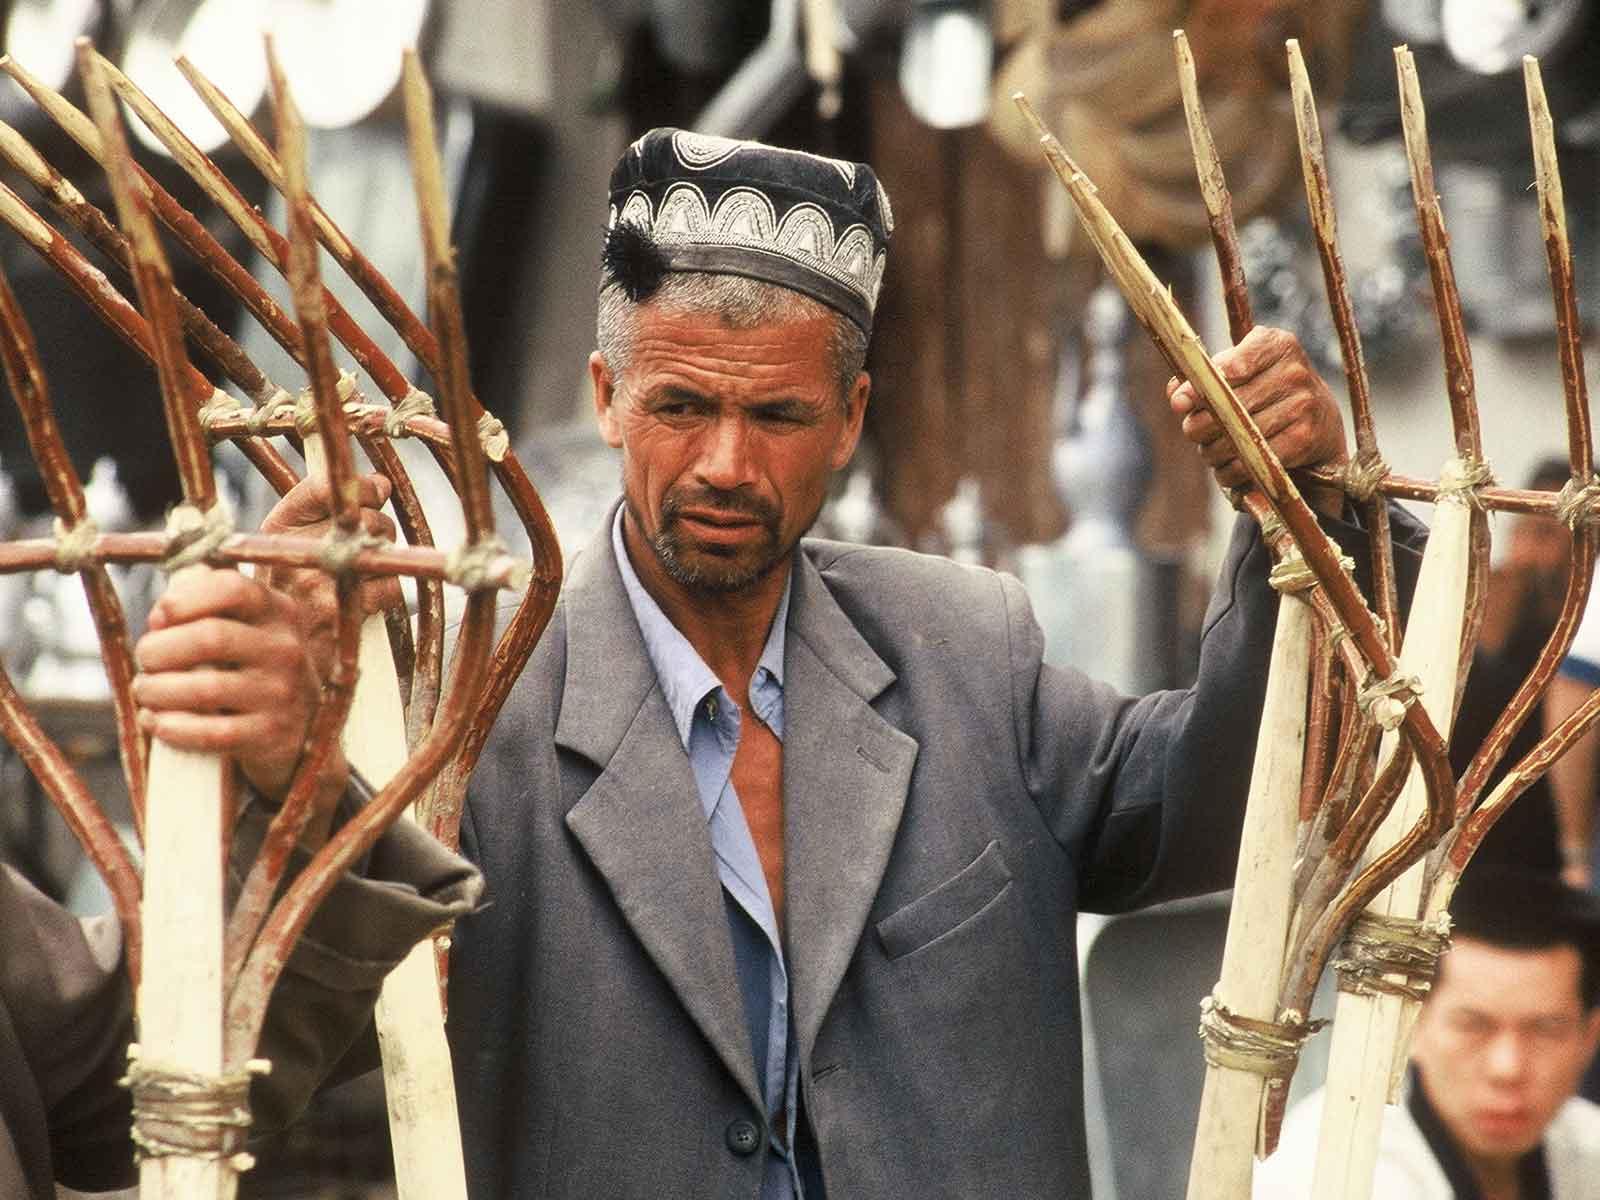 Kashgar Sunday Market - Xinjiang China - Silk Road Photo Journal - Steven Andrew Martin PhD - Study Abroad Research